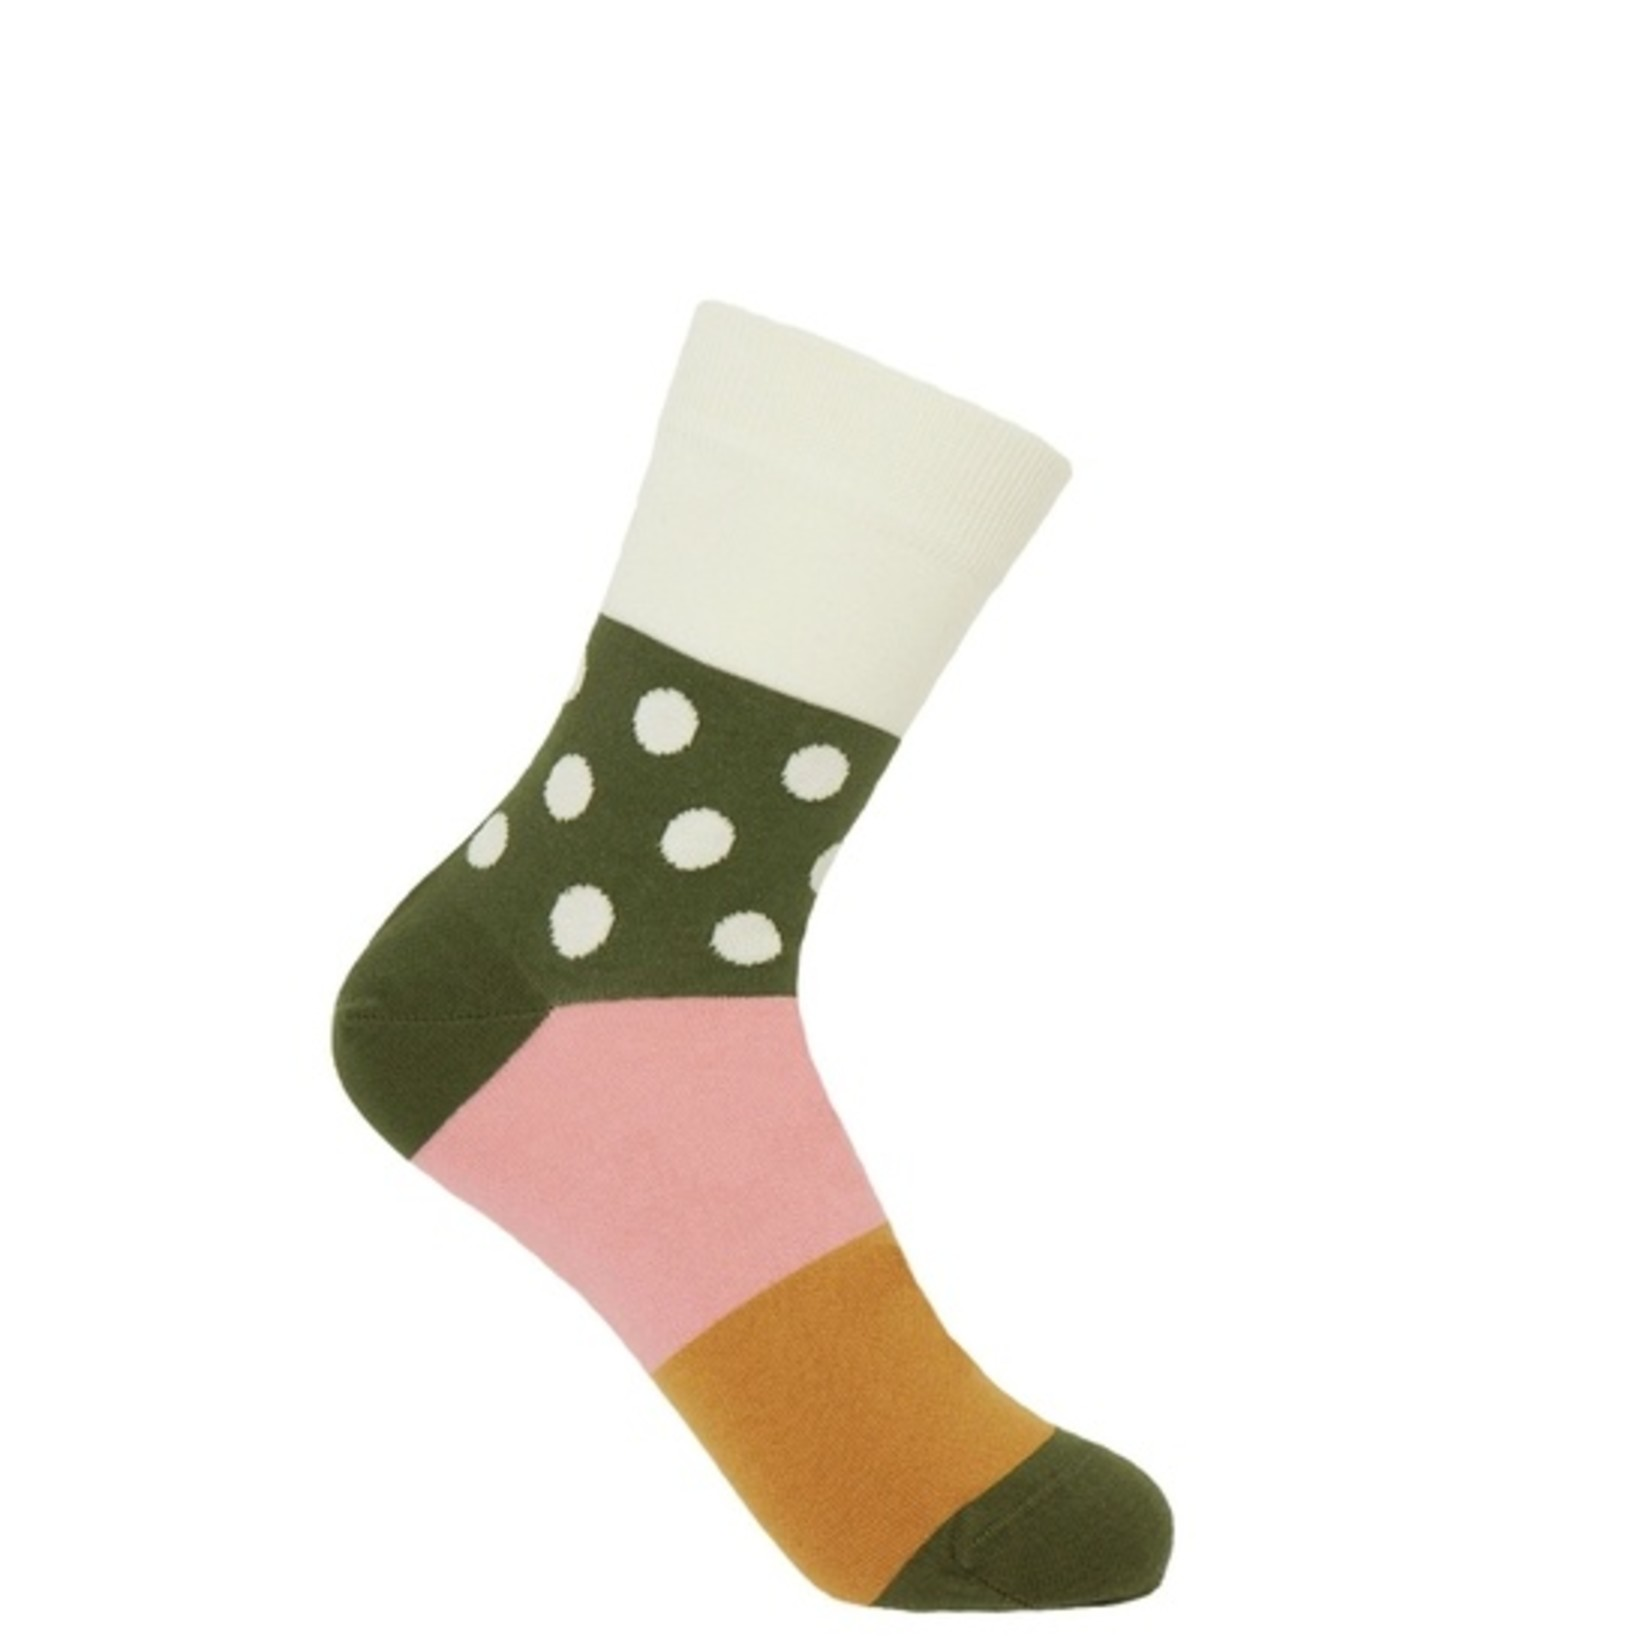 Peper Harow Mayfair Socks Cream